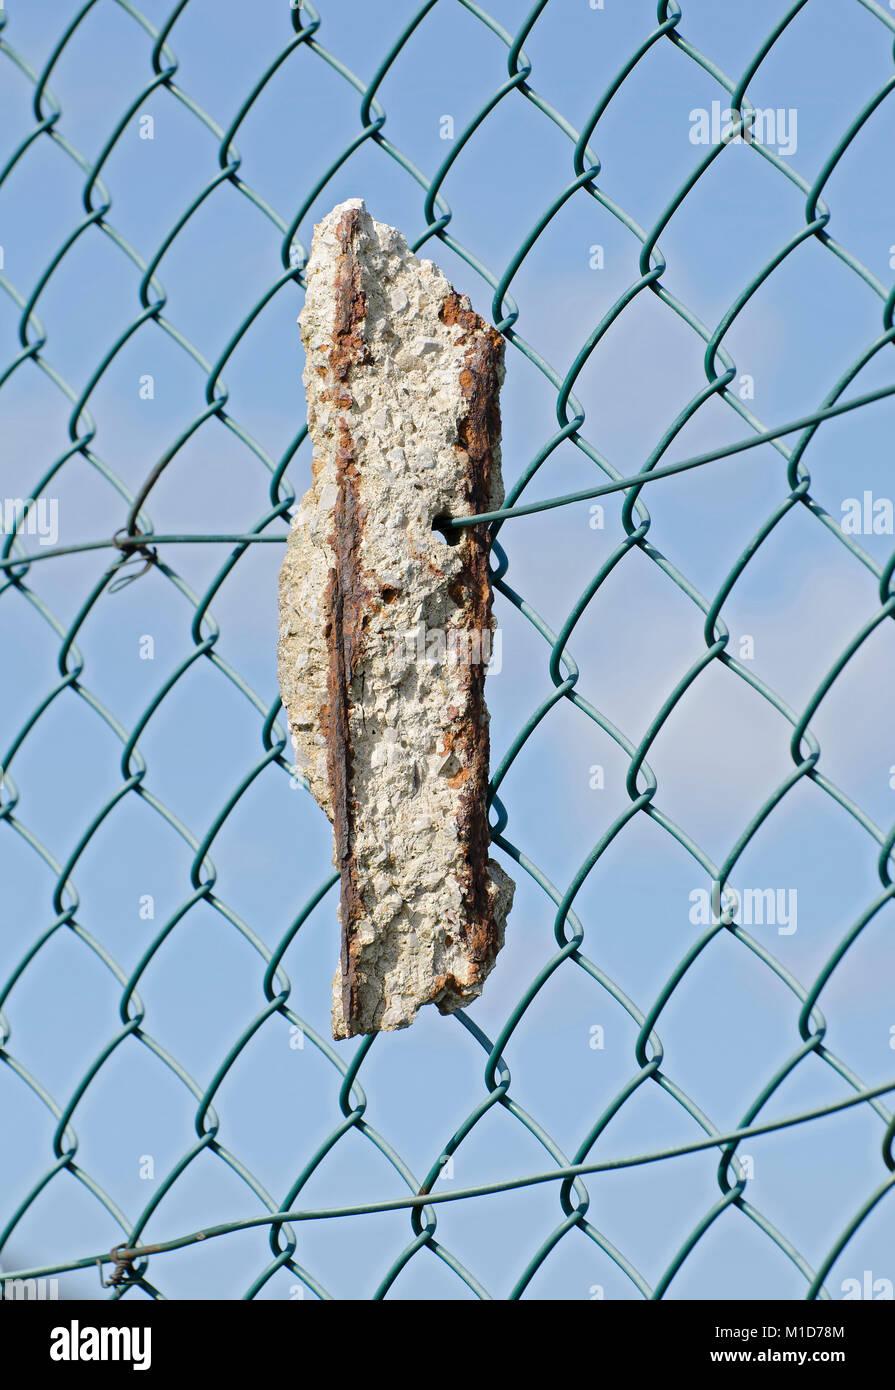 Broken Chain Link Fence Stockfotos & Broken Chain Link Fence Bilder ...